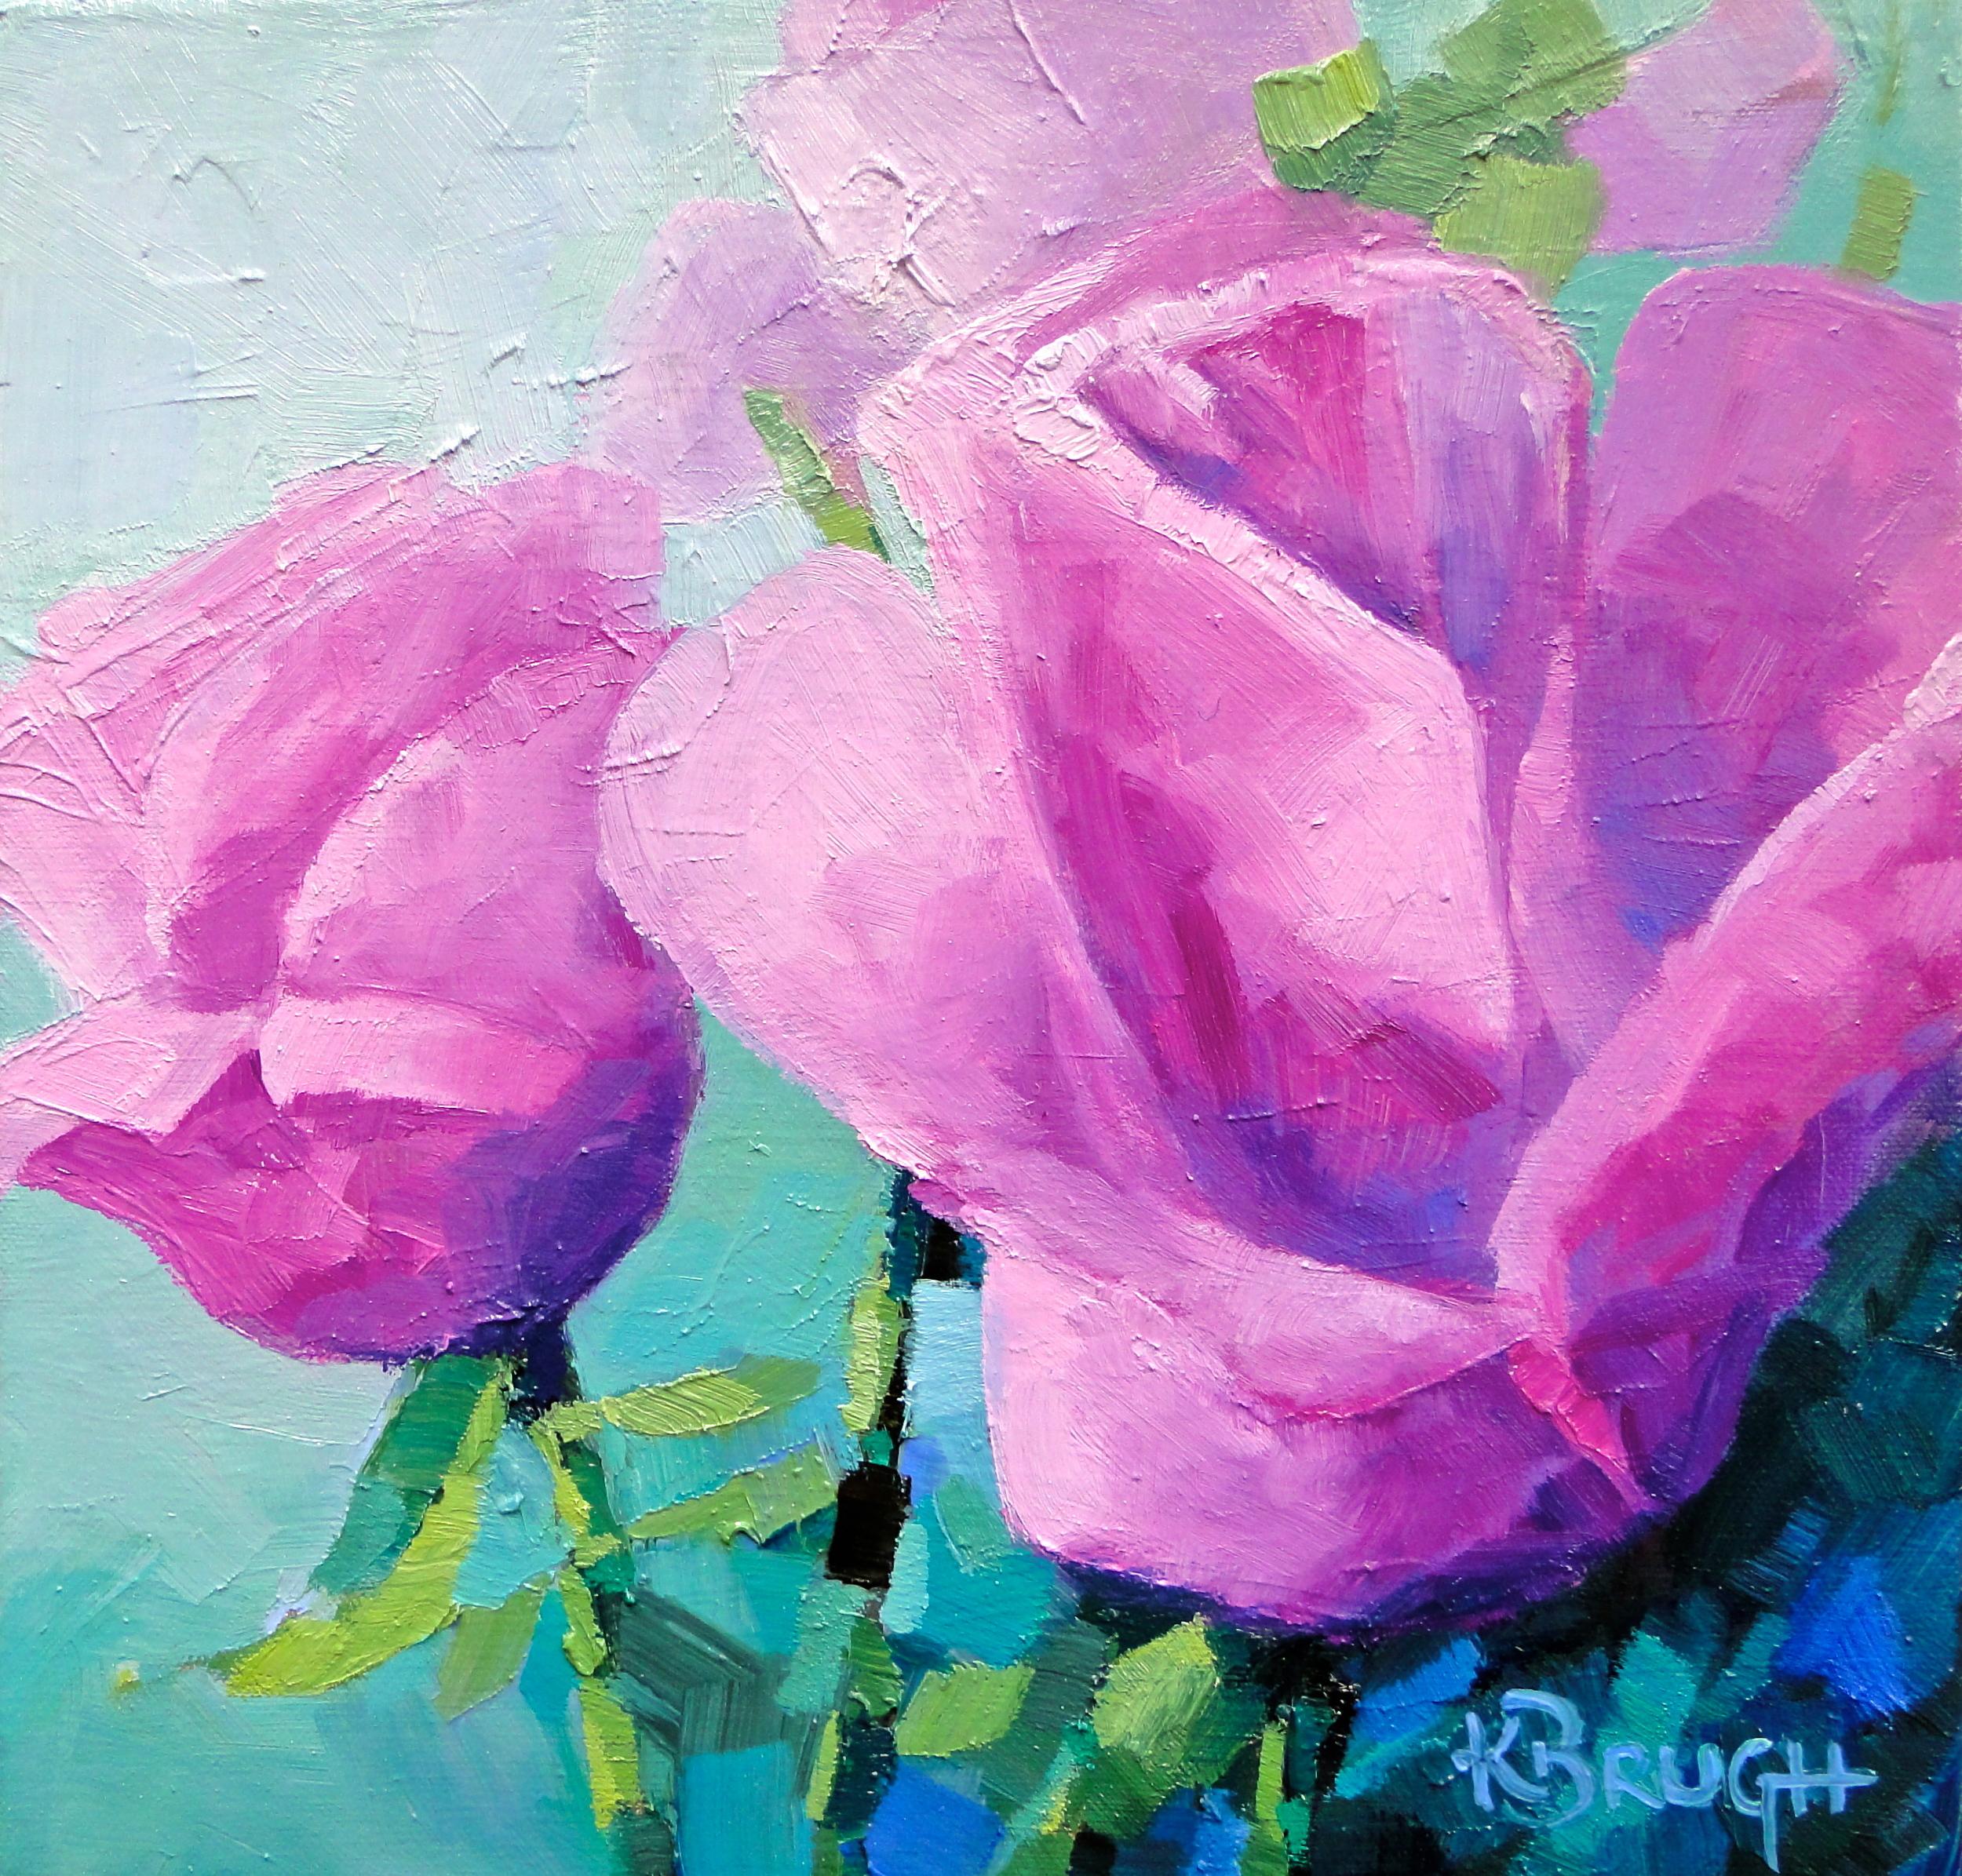 Garden Delights  by Kelley Brugh 12x12, Oil on canvas